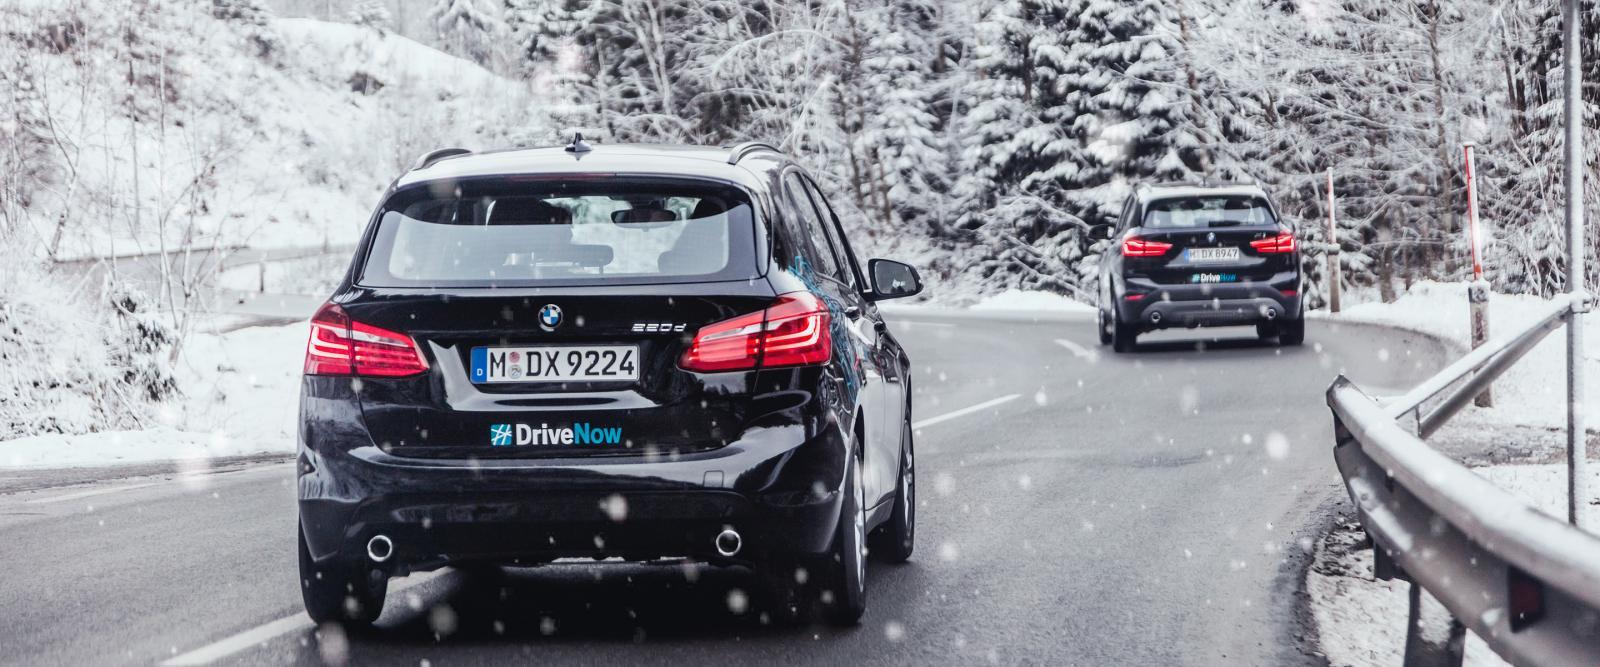 drivenow_munich_bmw_2series_x1_driving_winter_snow